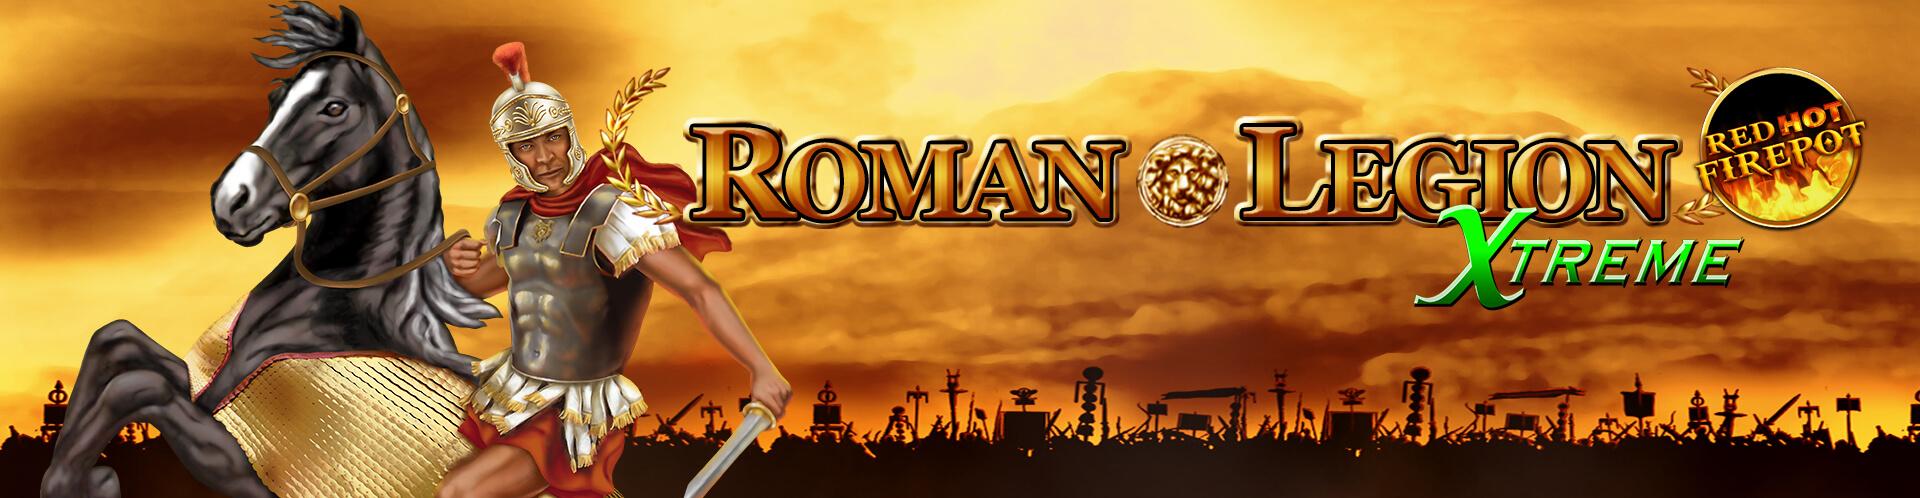 Roman Legion Extreme